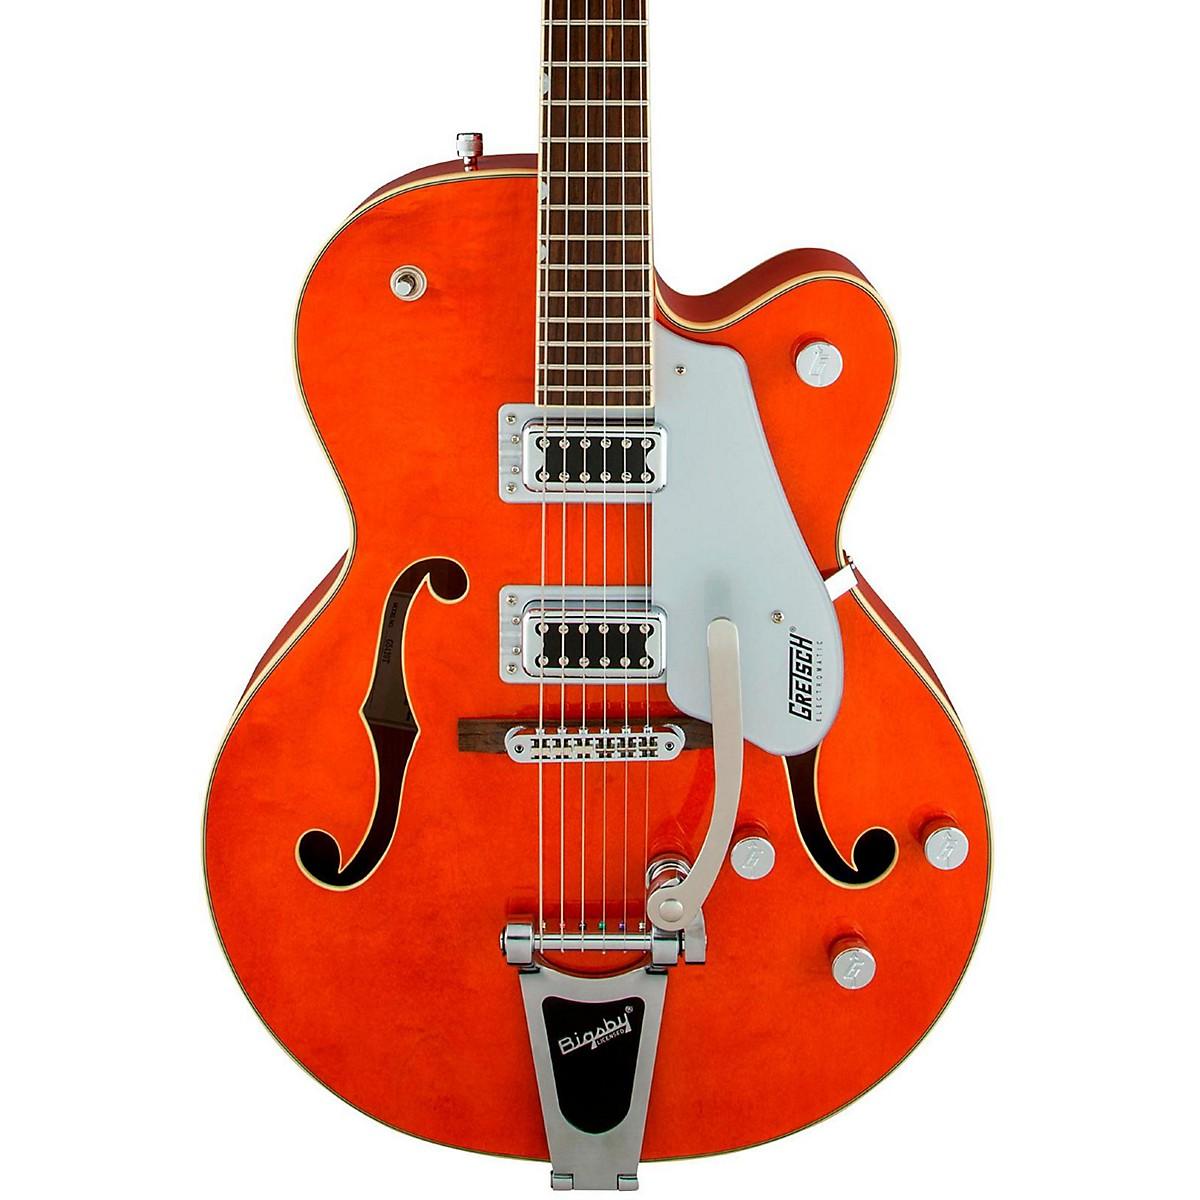 Gretsch Guitars G5420T Electromatic Hollowbody Electric Guitar